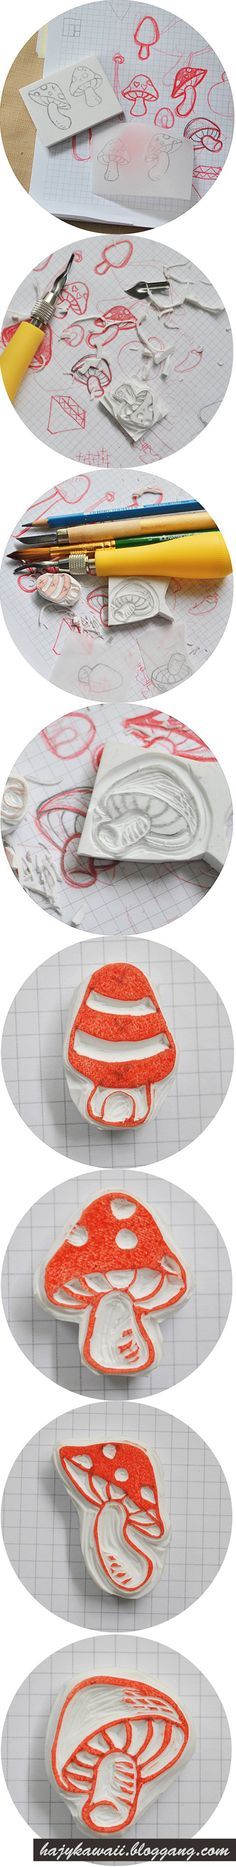 Mushroom Eraser stamp |  Bloggang.com : Gin-GaL :